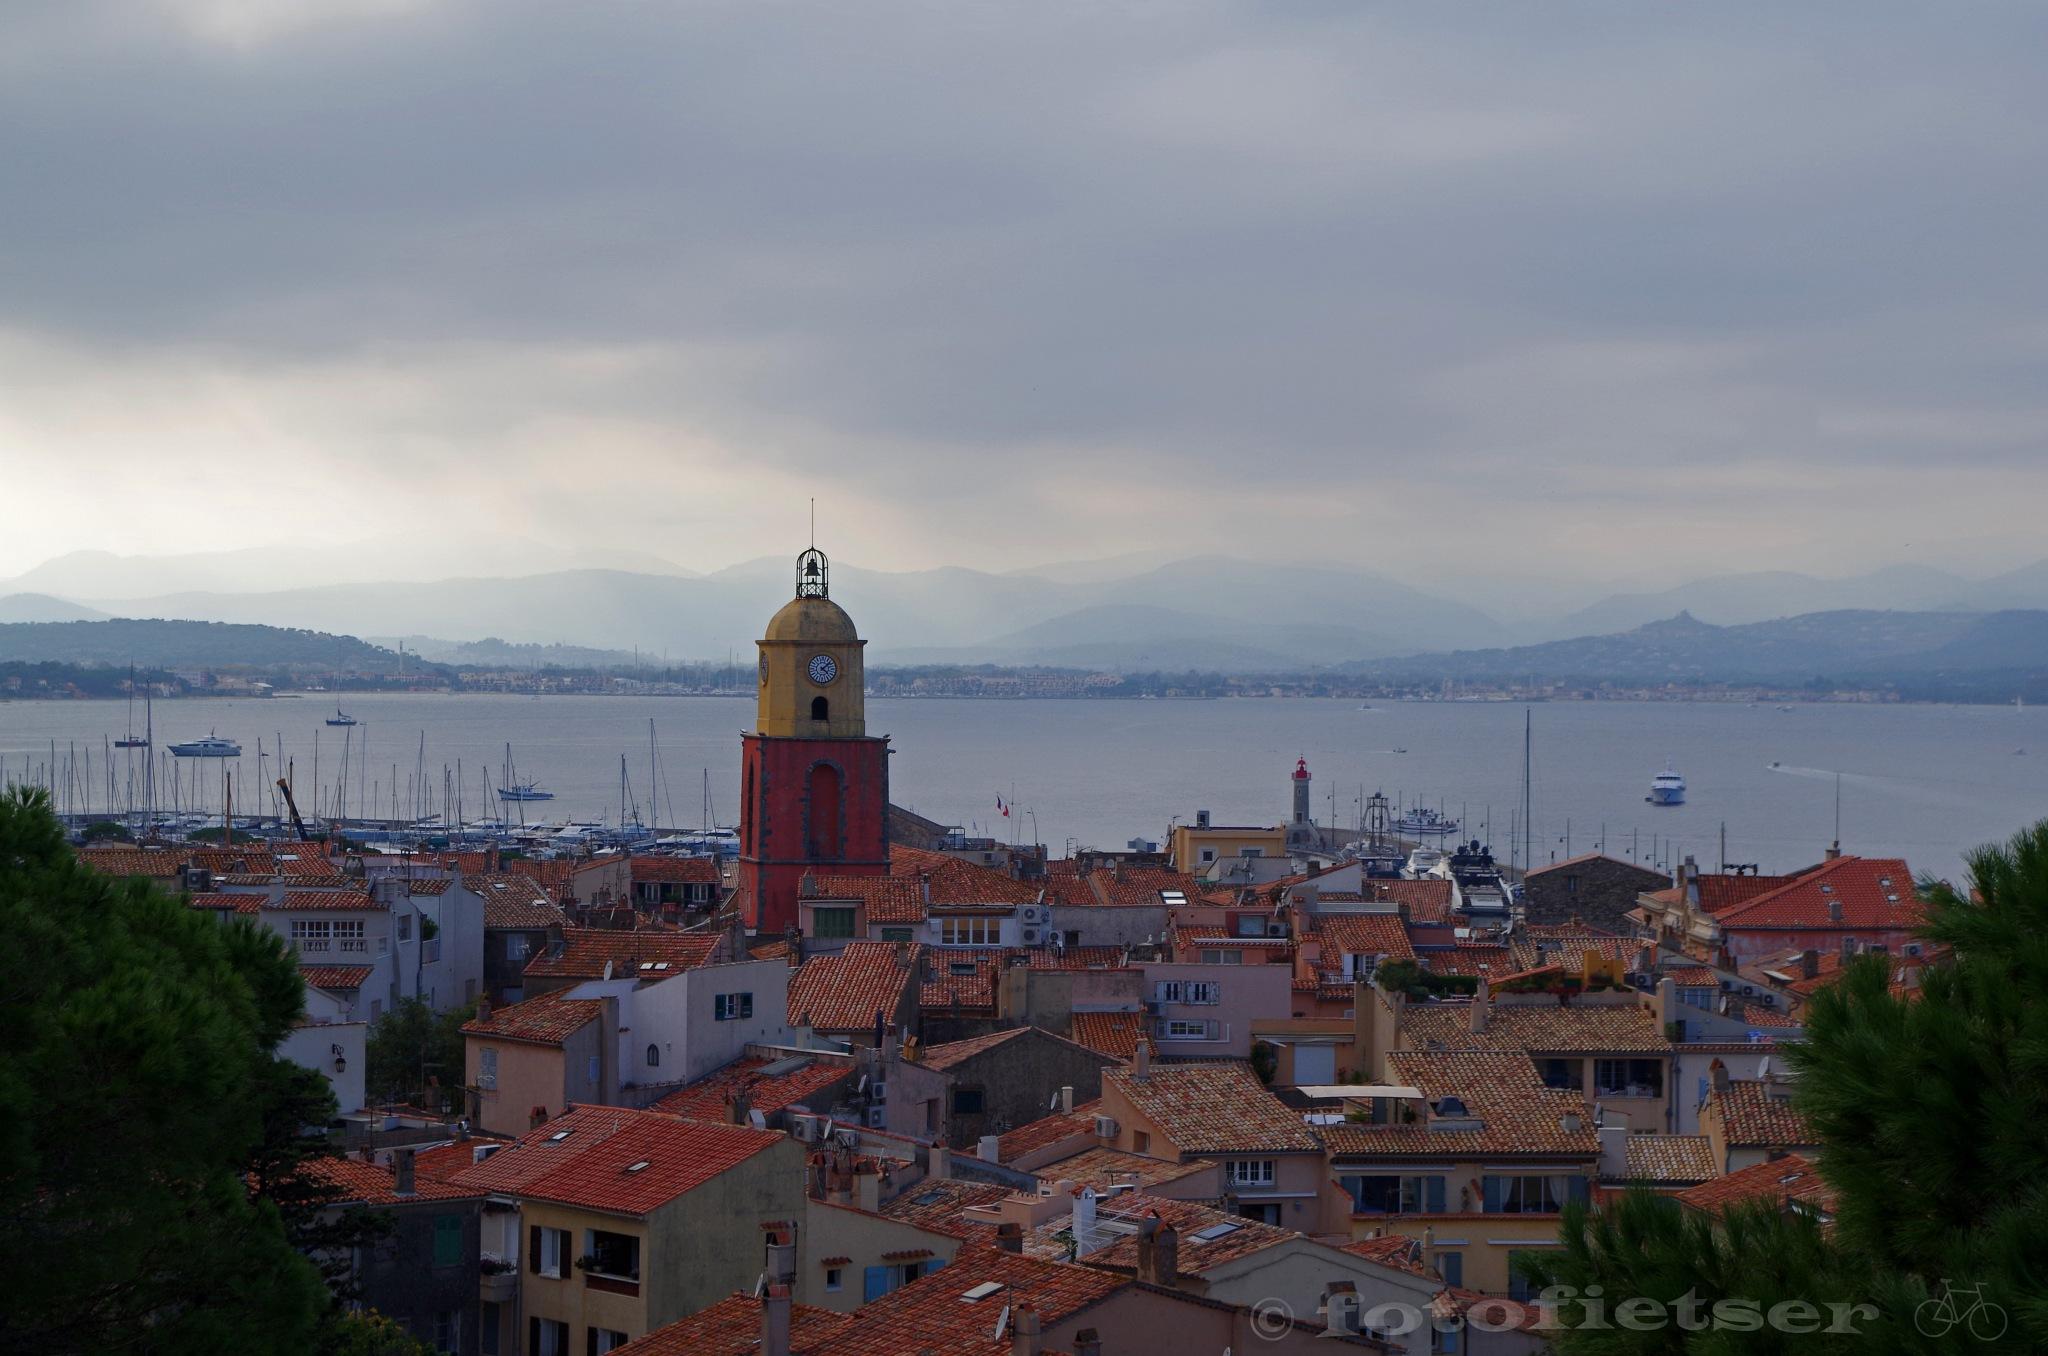 a View at Saint-Tropez by fotofietser